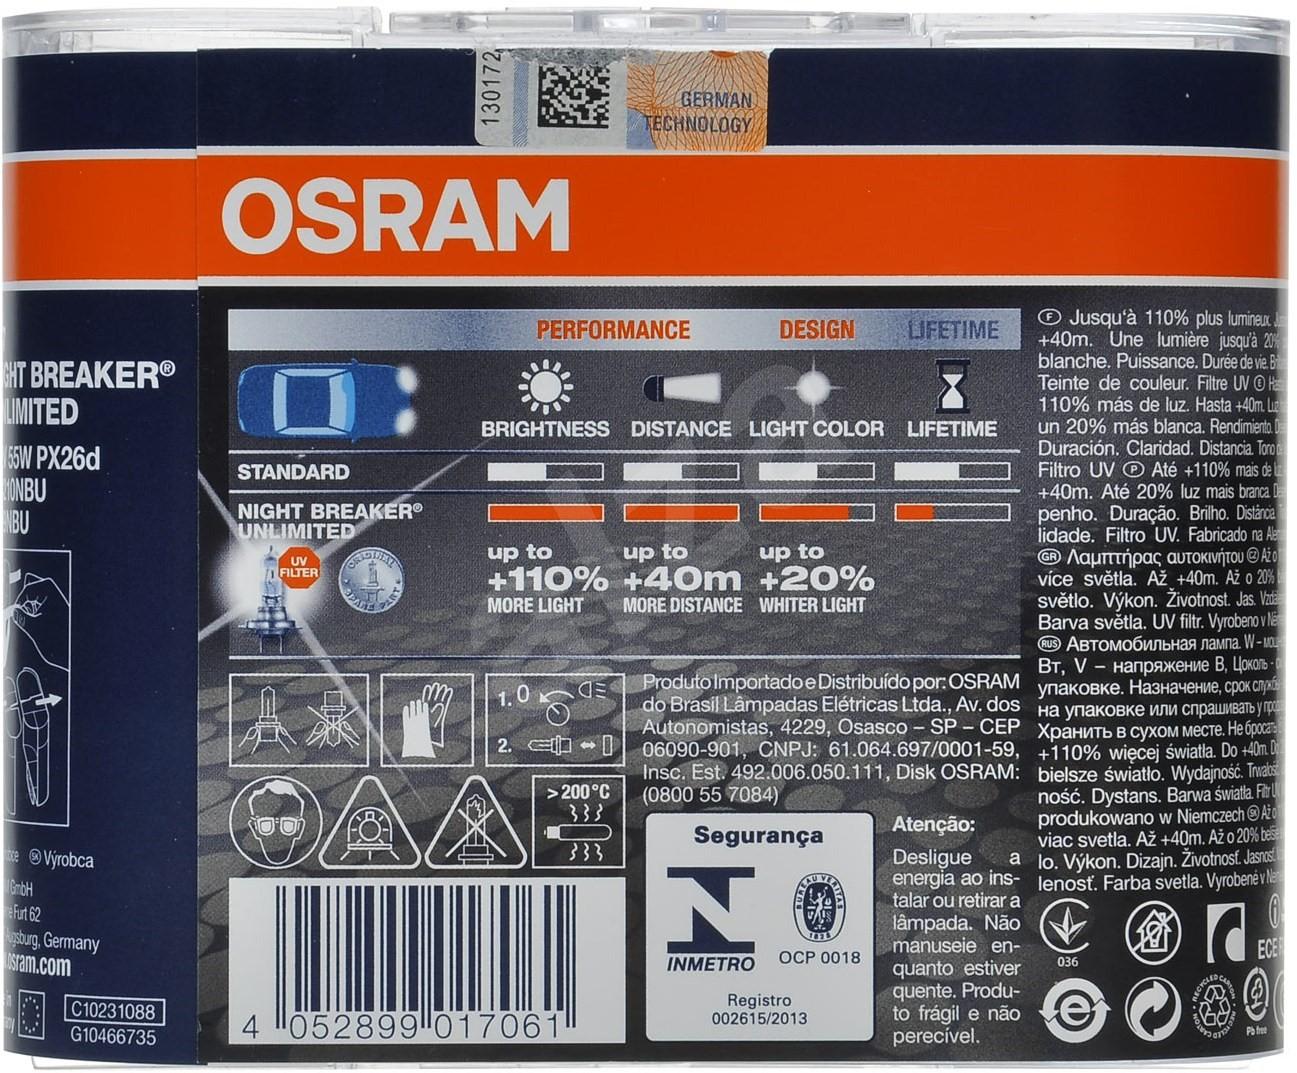 osram night breaker unlimited h7 55w px26d 2pcs light. Black Bedroom Furniture Sets. Home Design Ideas